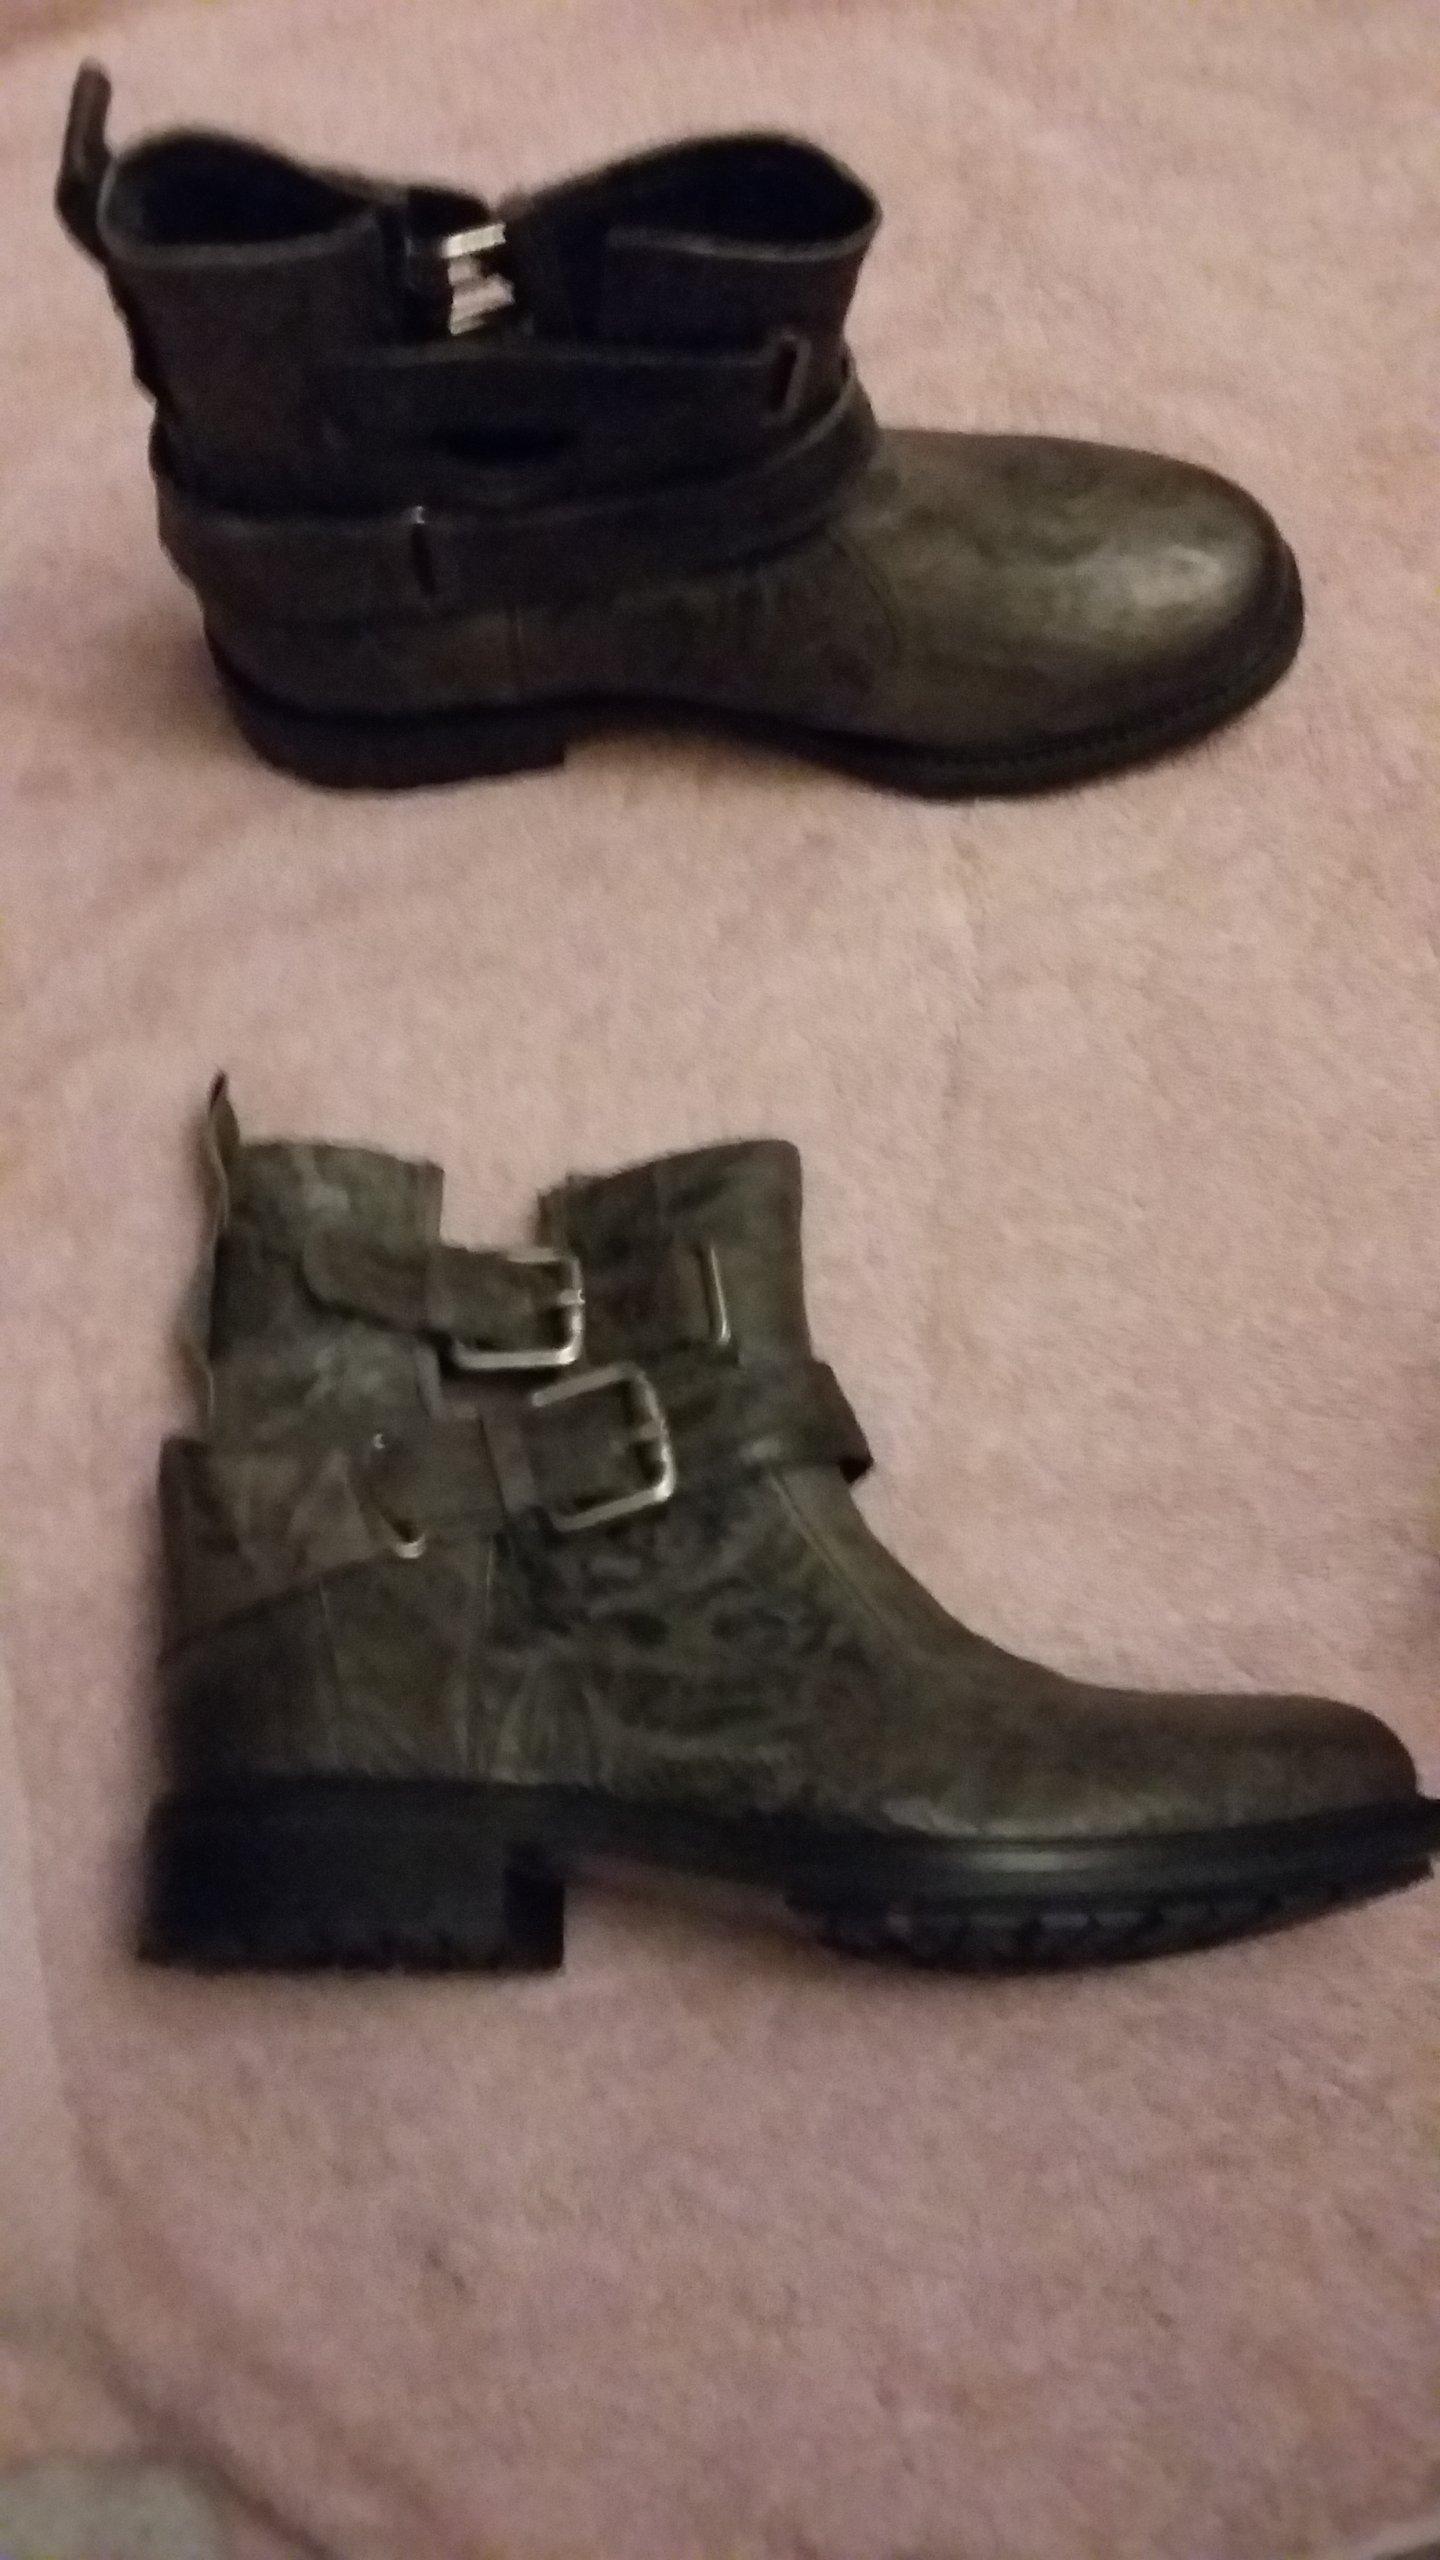 bf6c216f44bec nord shoes w Oficjalnym Archiwum Allegro - archiwum ofert